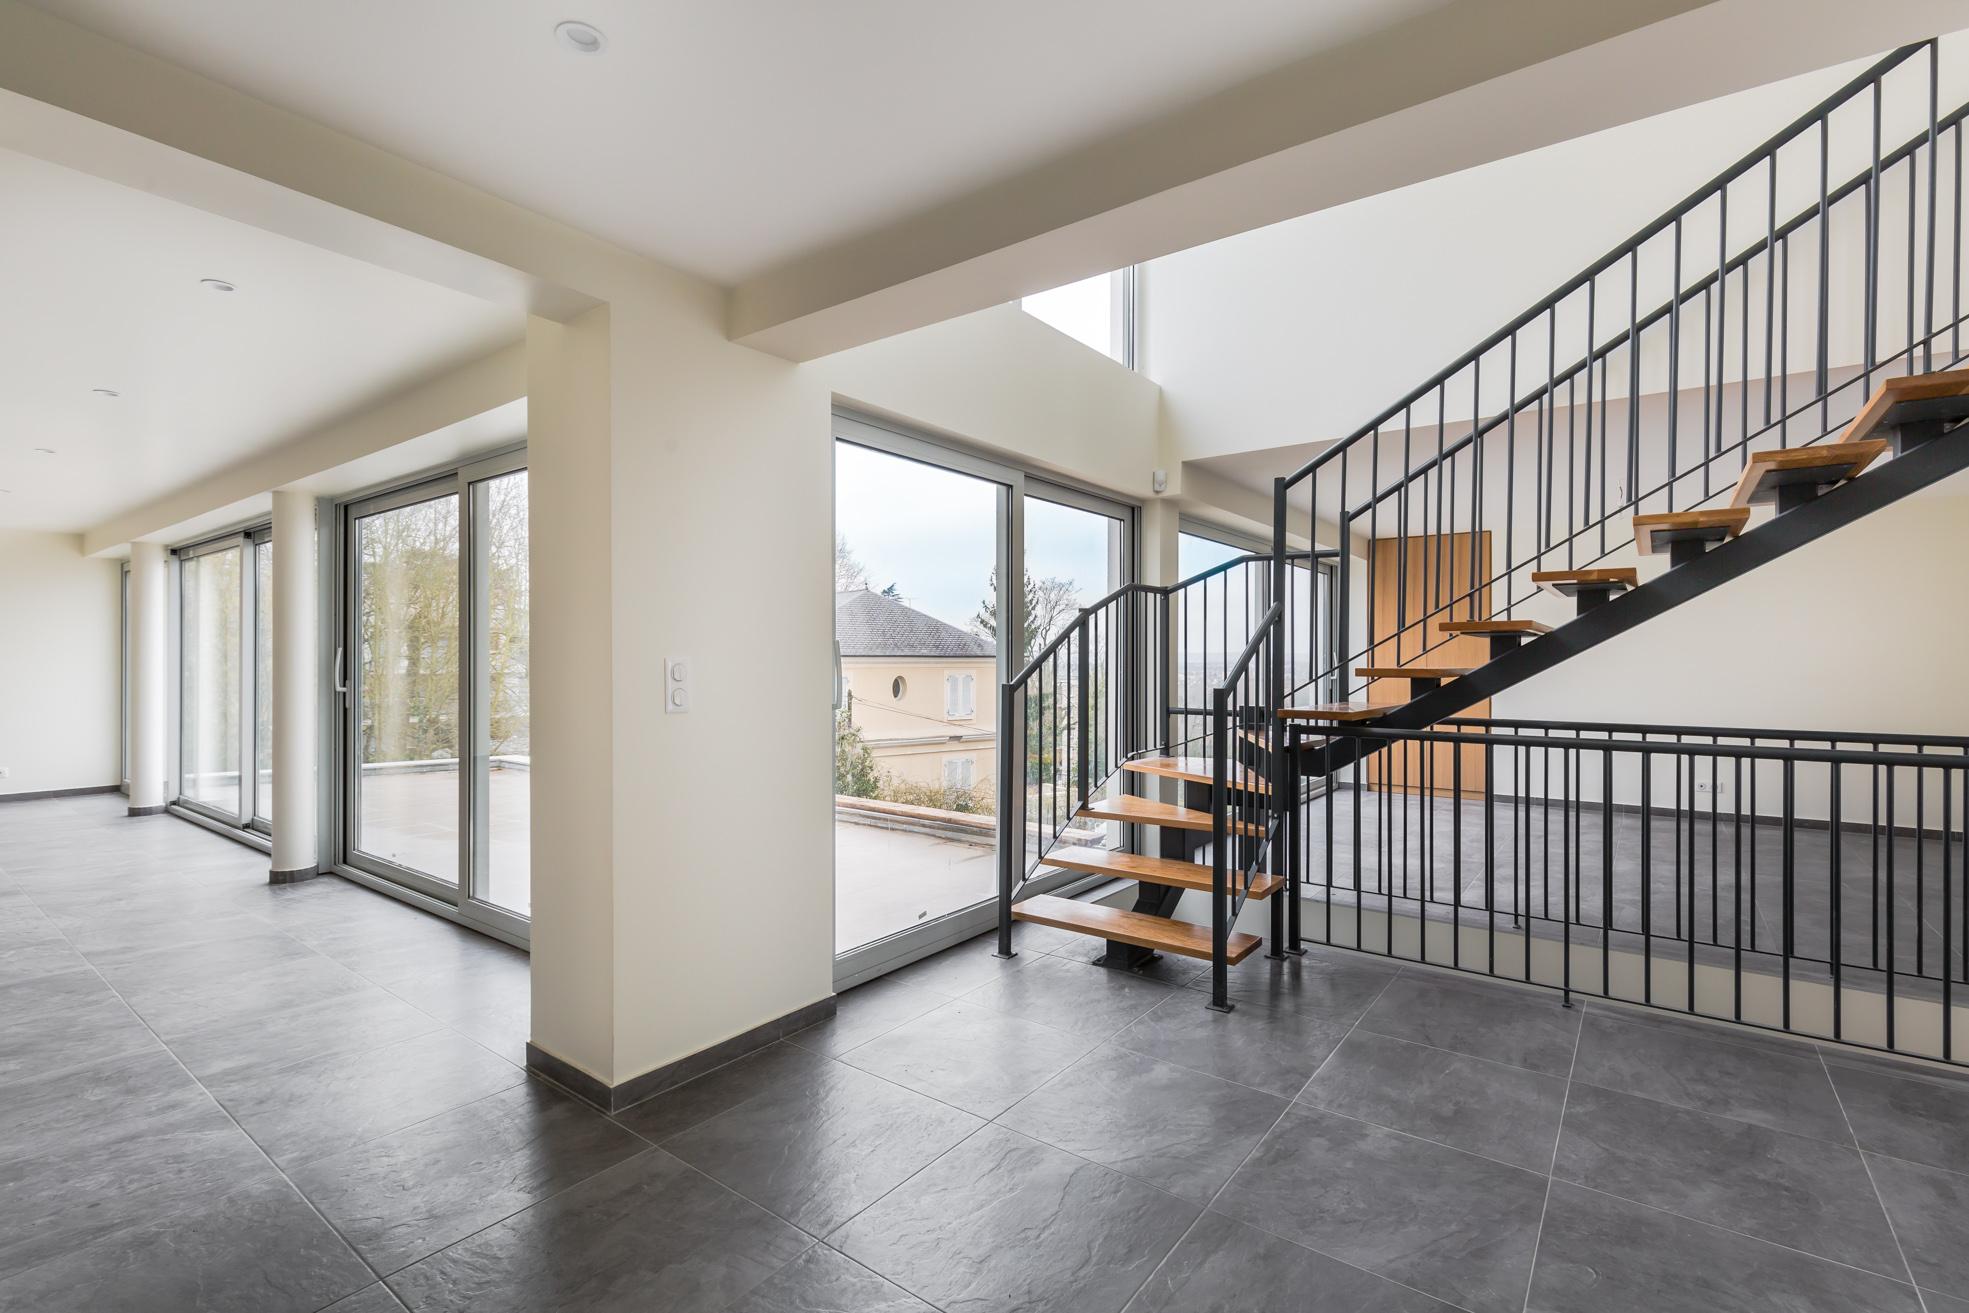 photographe immobilier mettre en valeur son bien immobilier. Black Bedroom Furniture Sets. Home Design Ideas